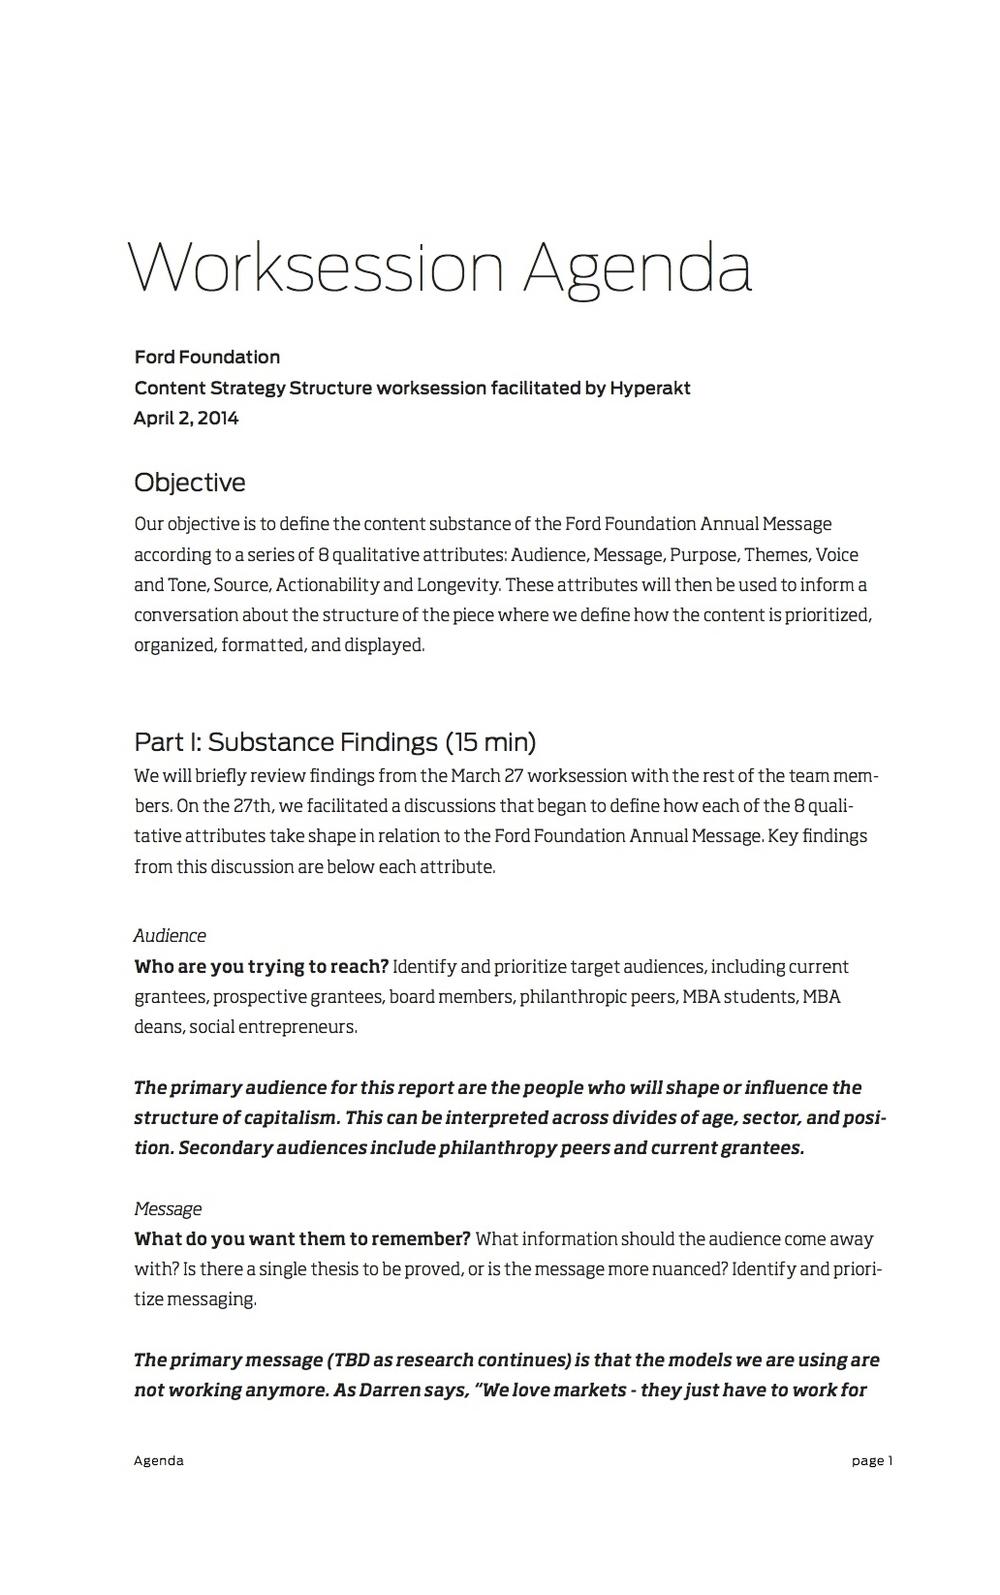 FF Workshop Structure Agenda 20140401 AR.jpg